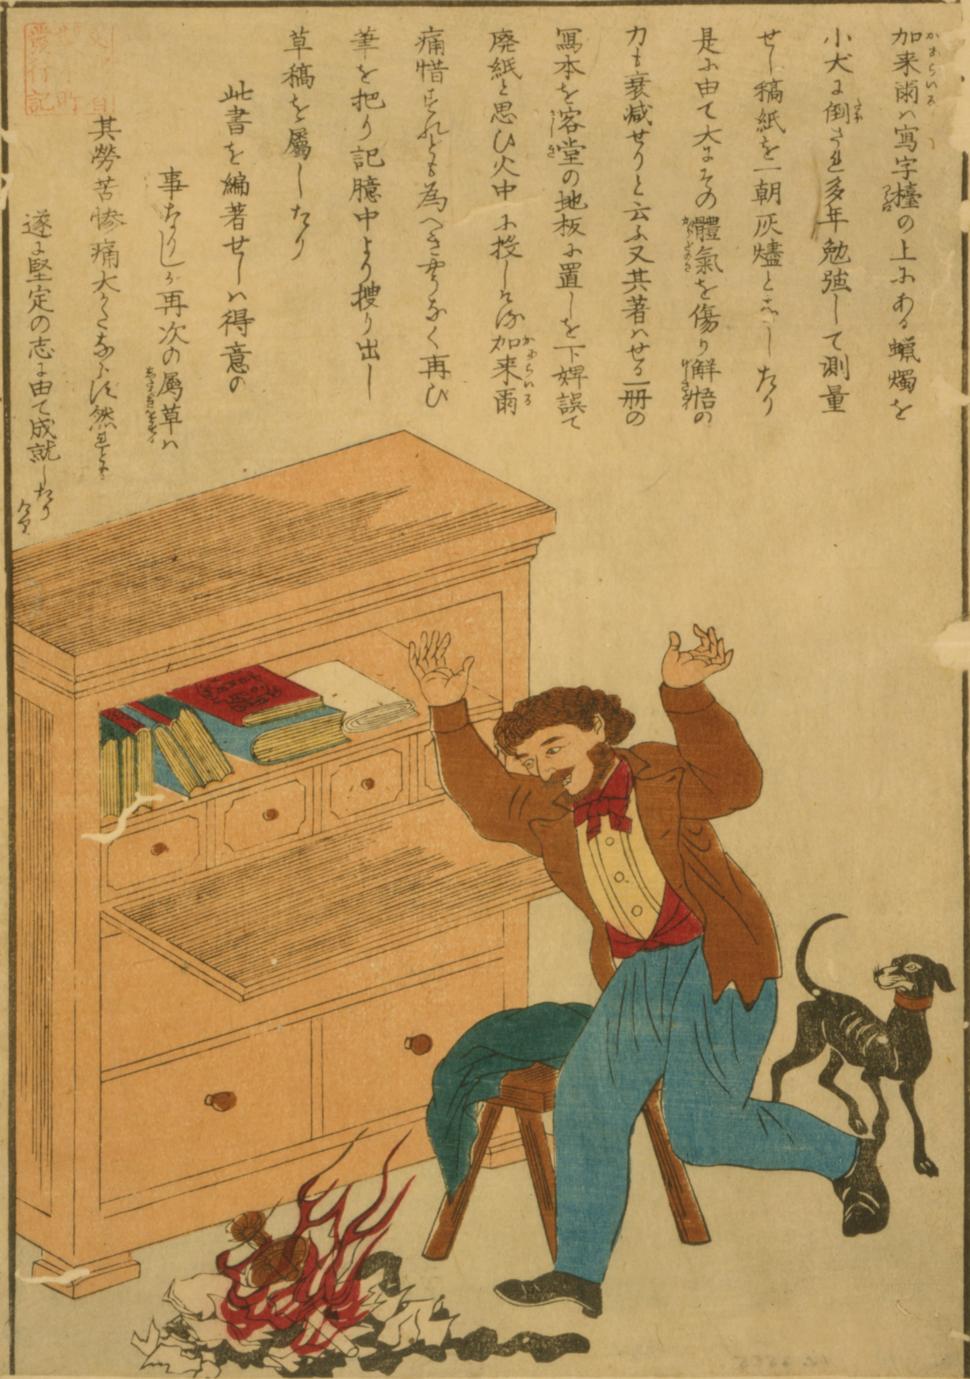 Carlyle manuscript burning Japan cph.3g10399